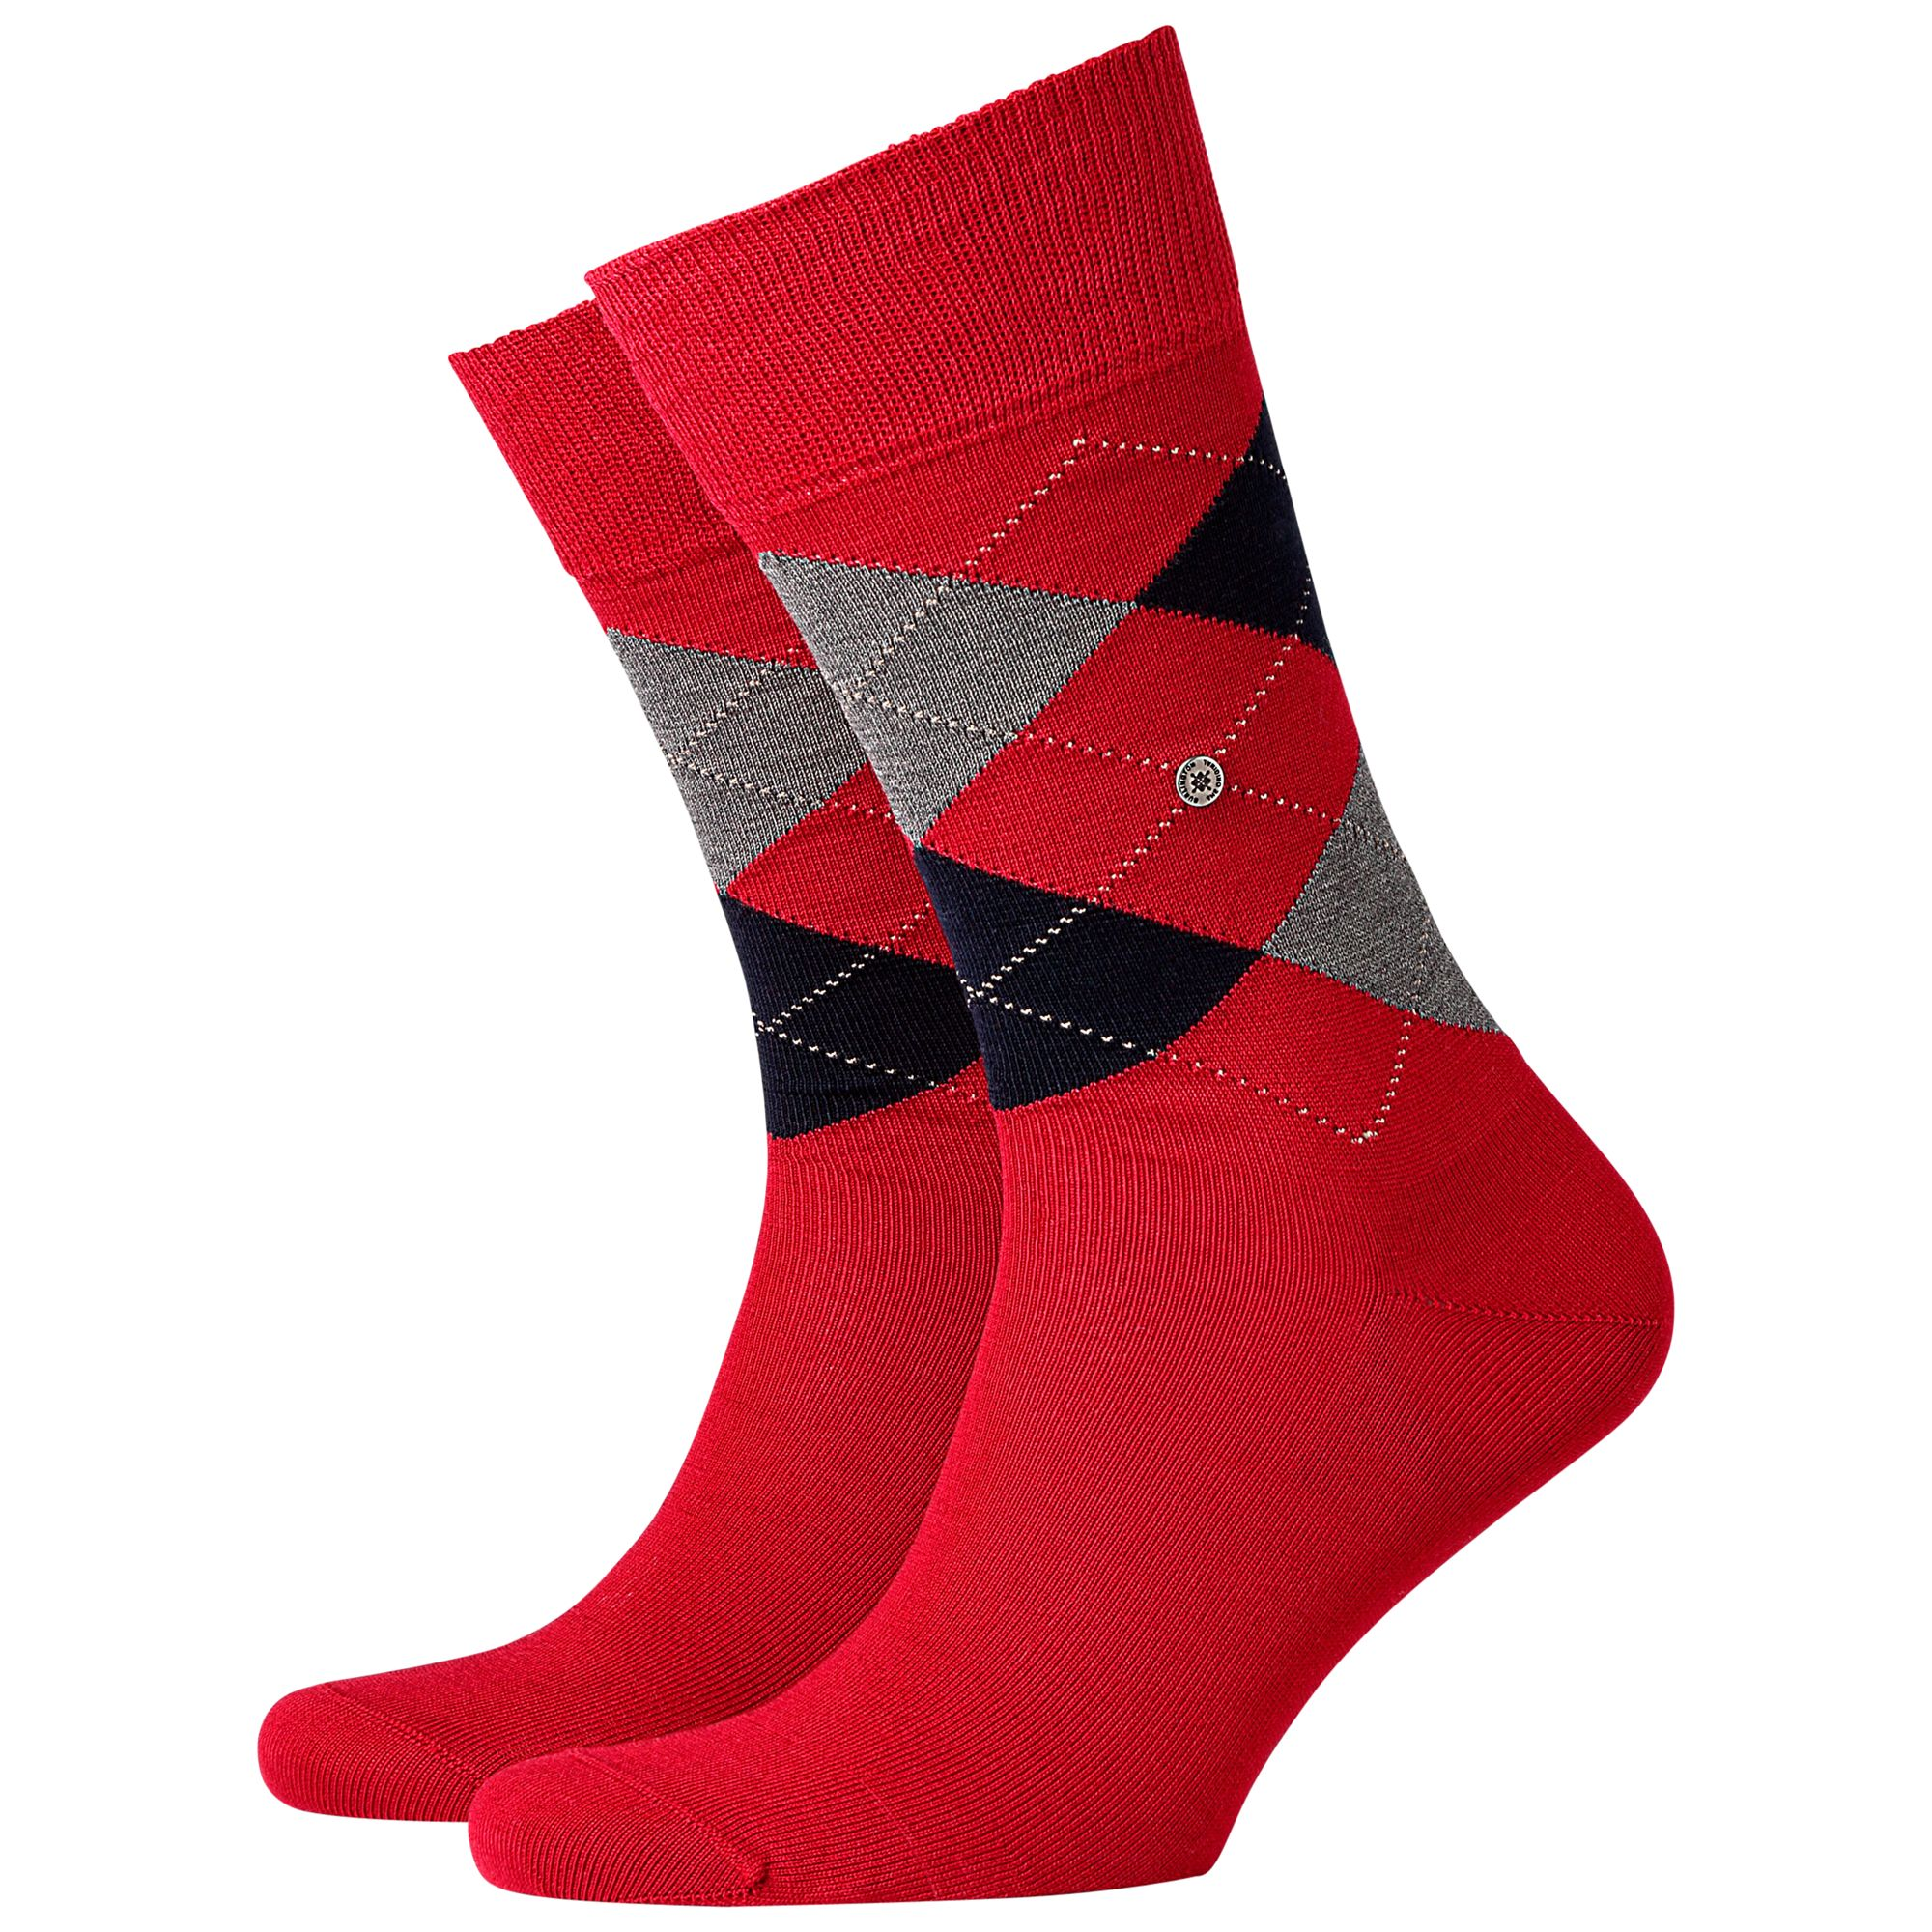 Burlington Burlington Manchester Short Socks, One Size, Red